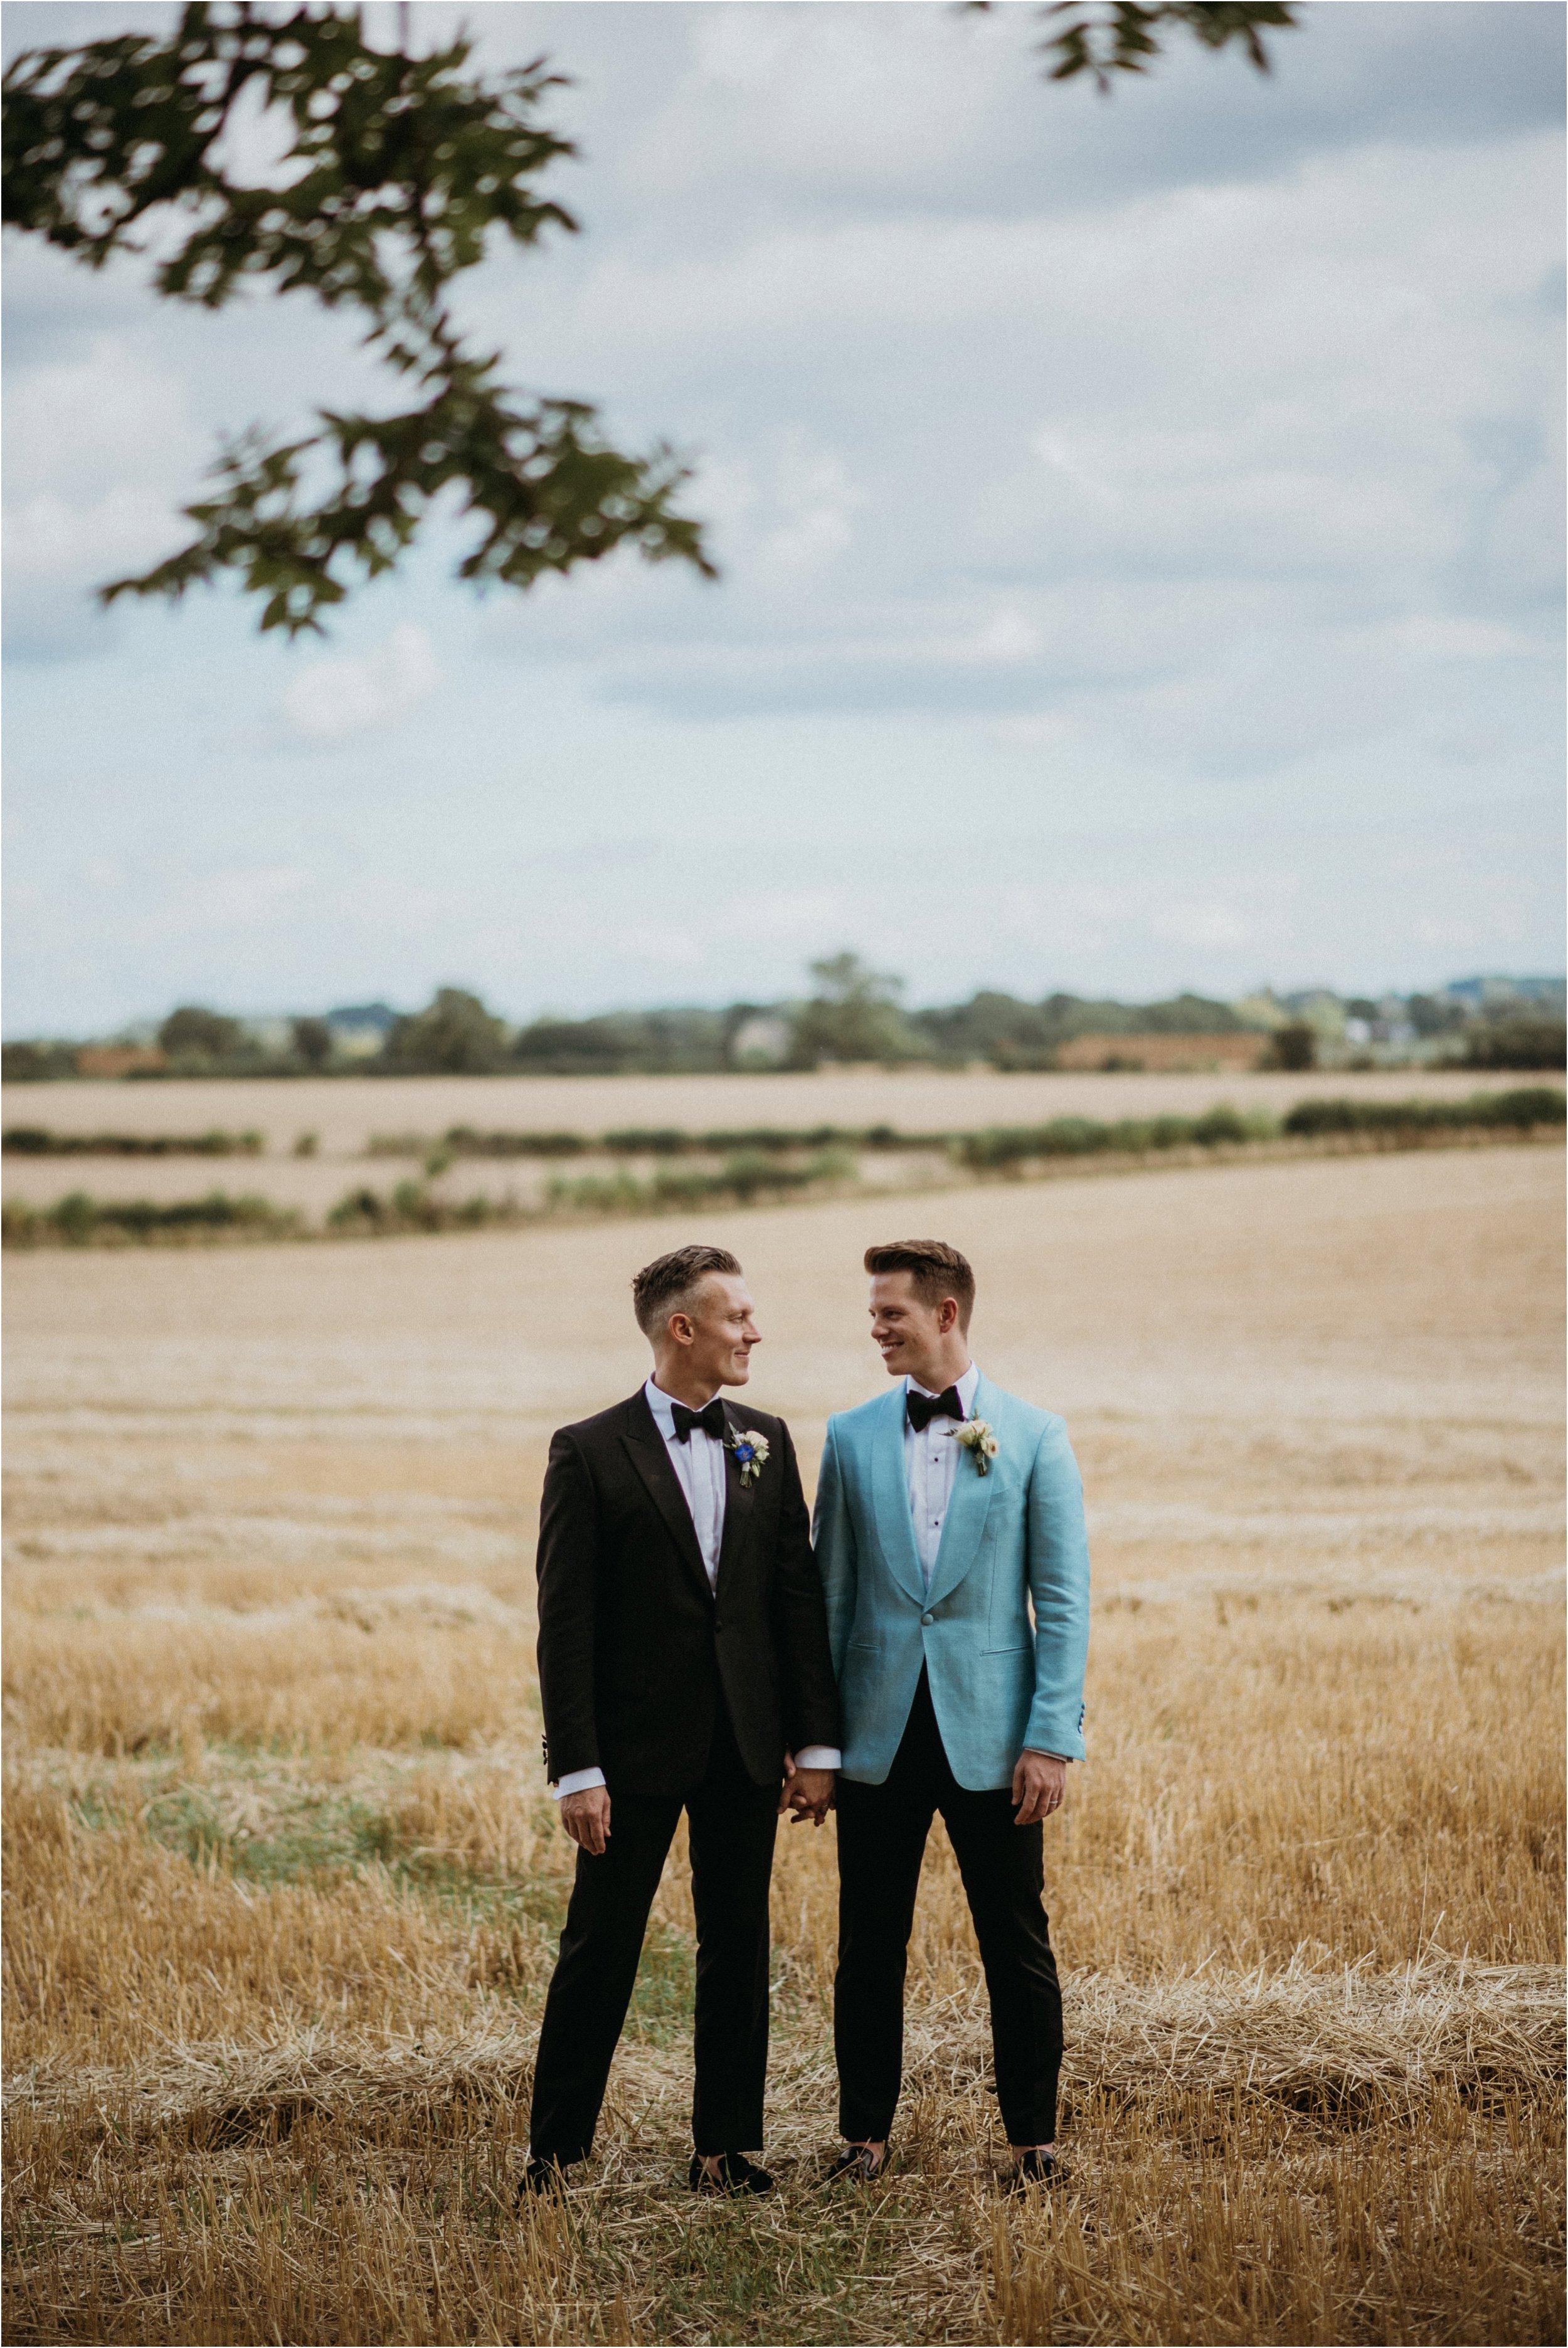 Cripps Barn wedding photography_0117.jpg